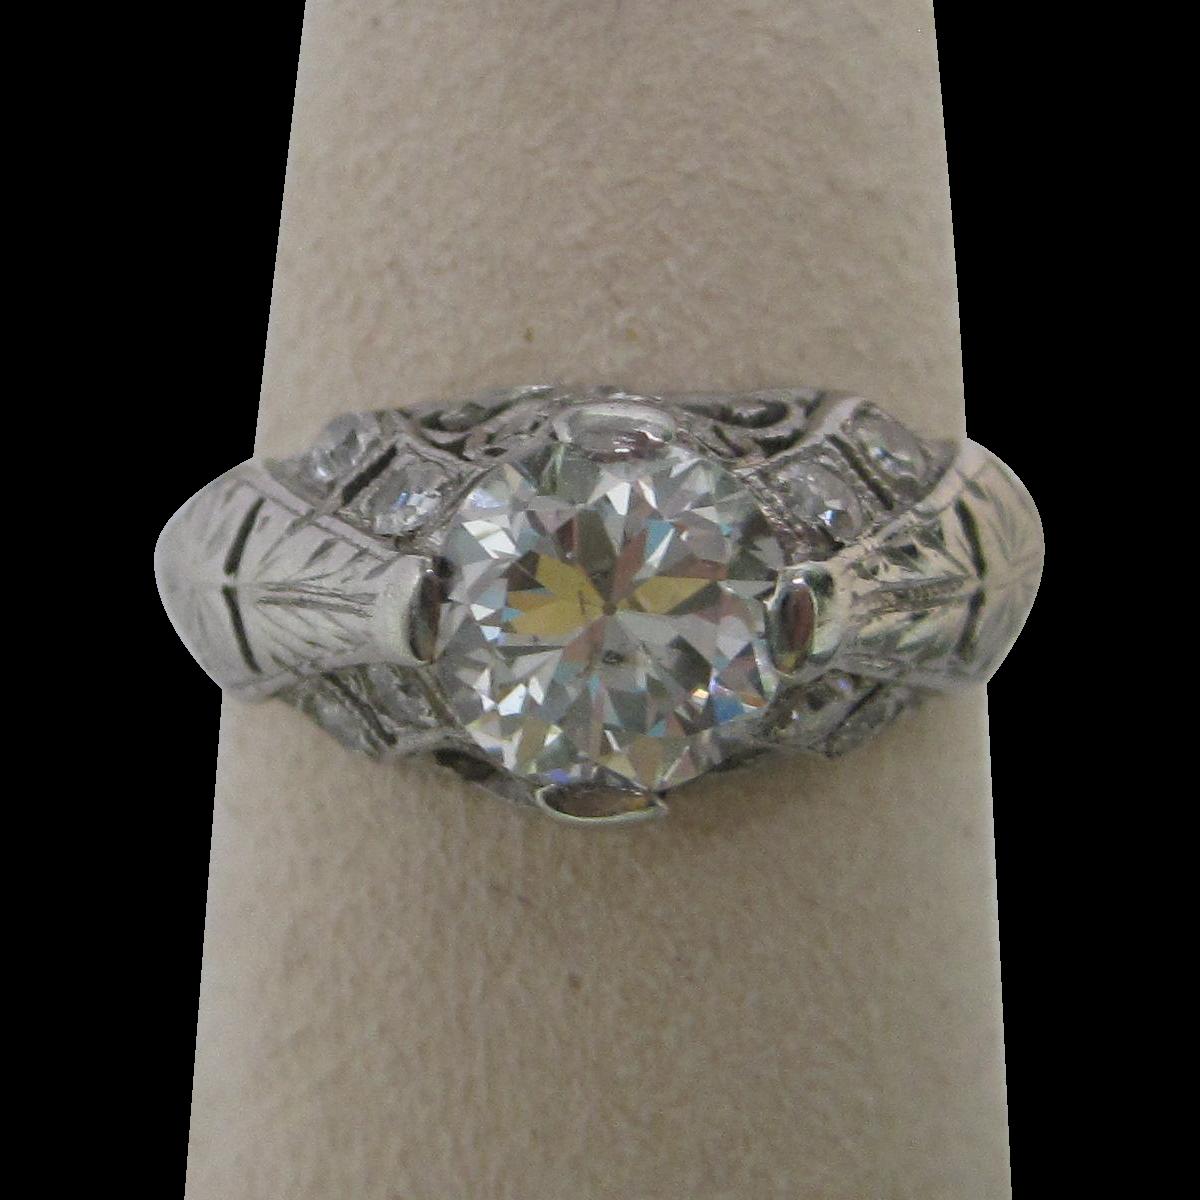 Art Deco 1.45 cttw Diamond Platinum Engagement Ring All original Rare not a copy!